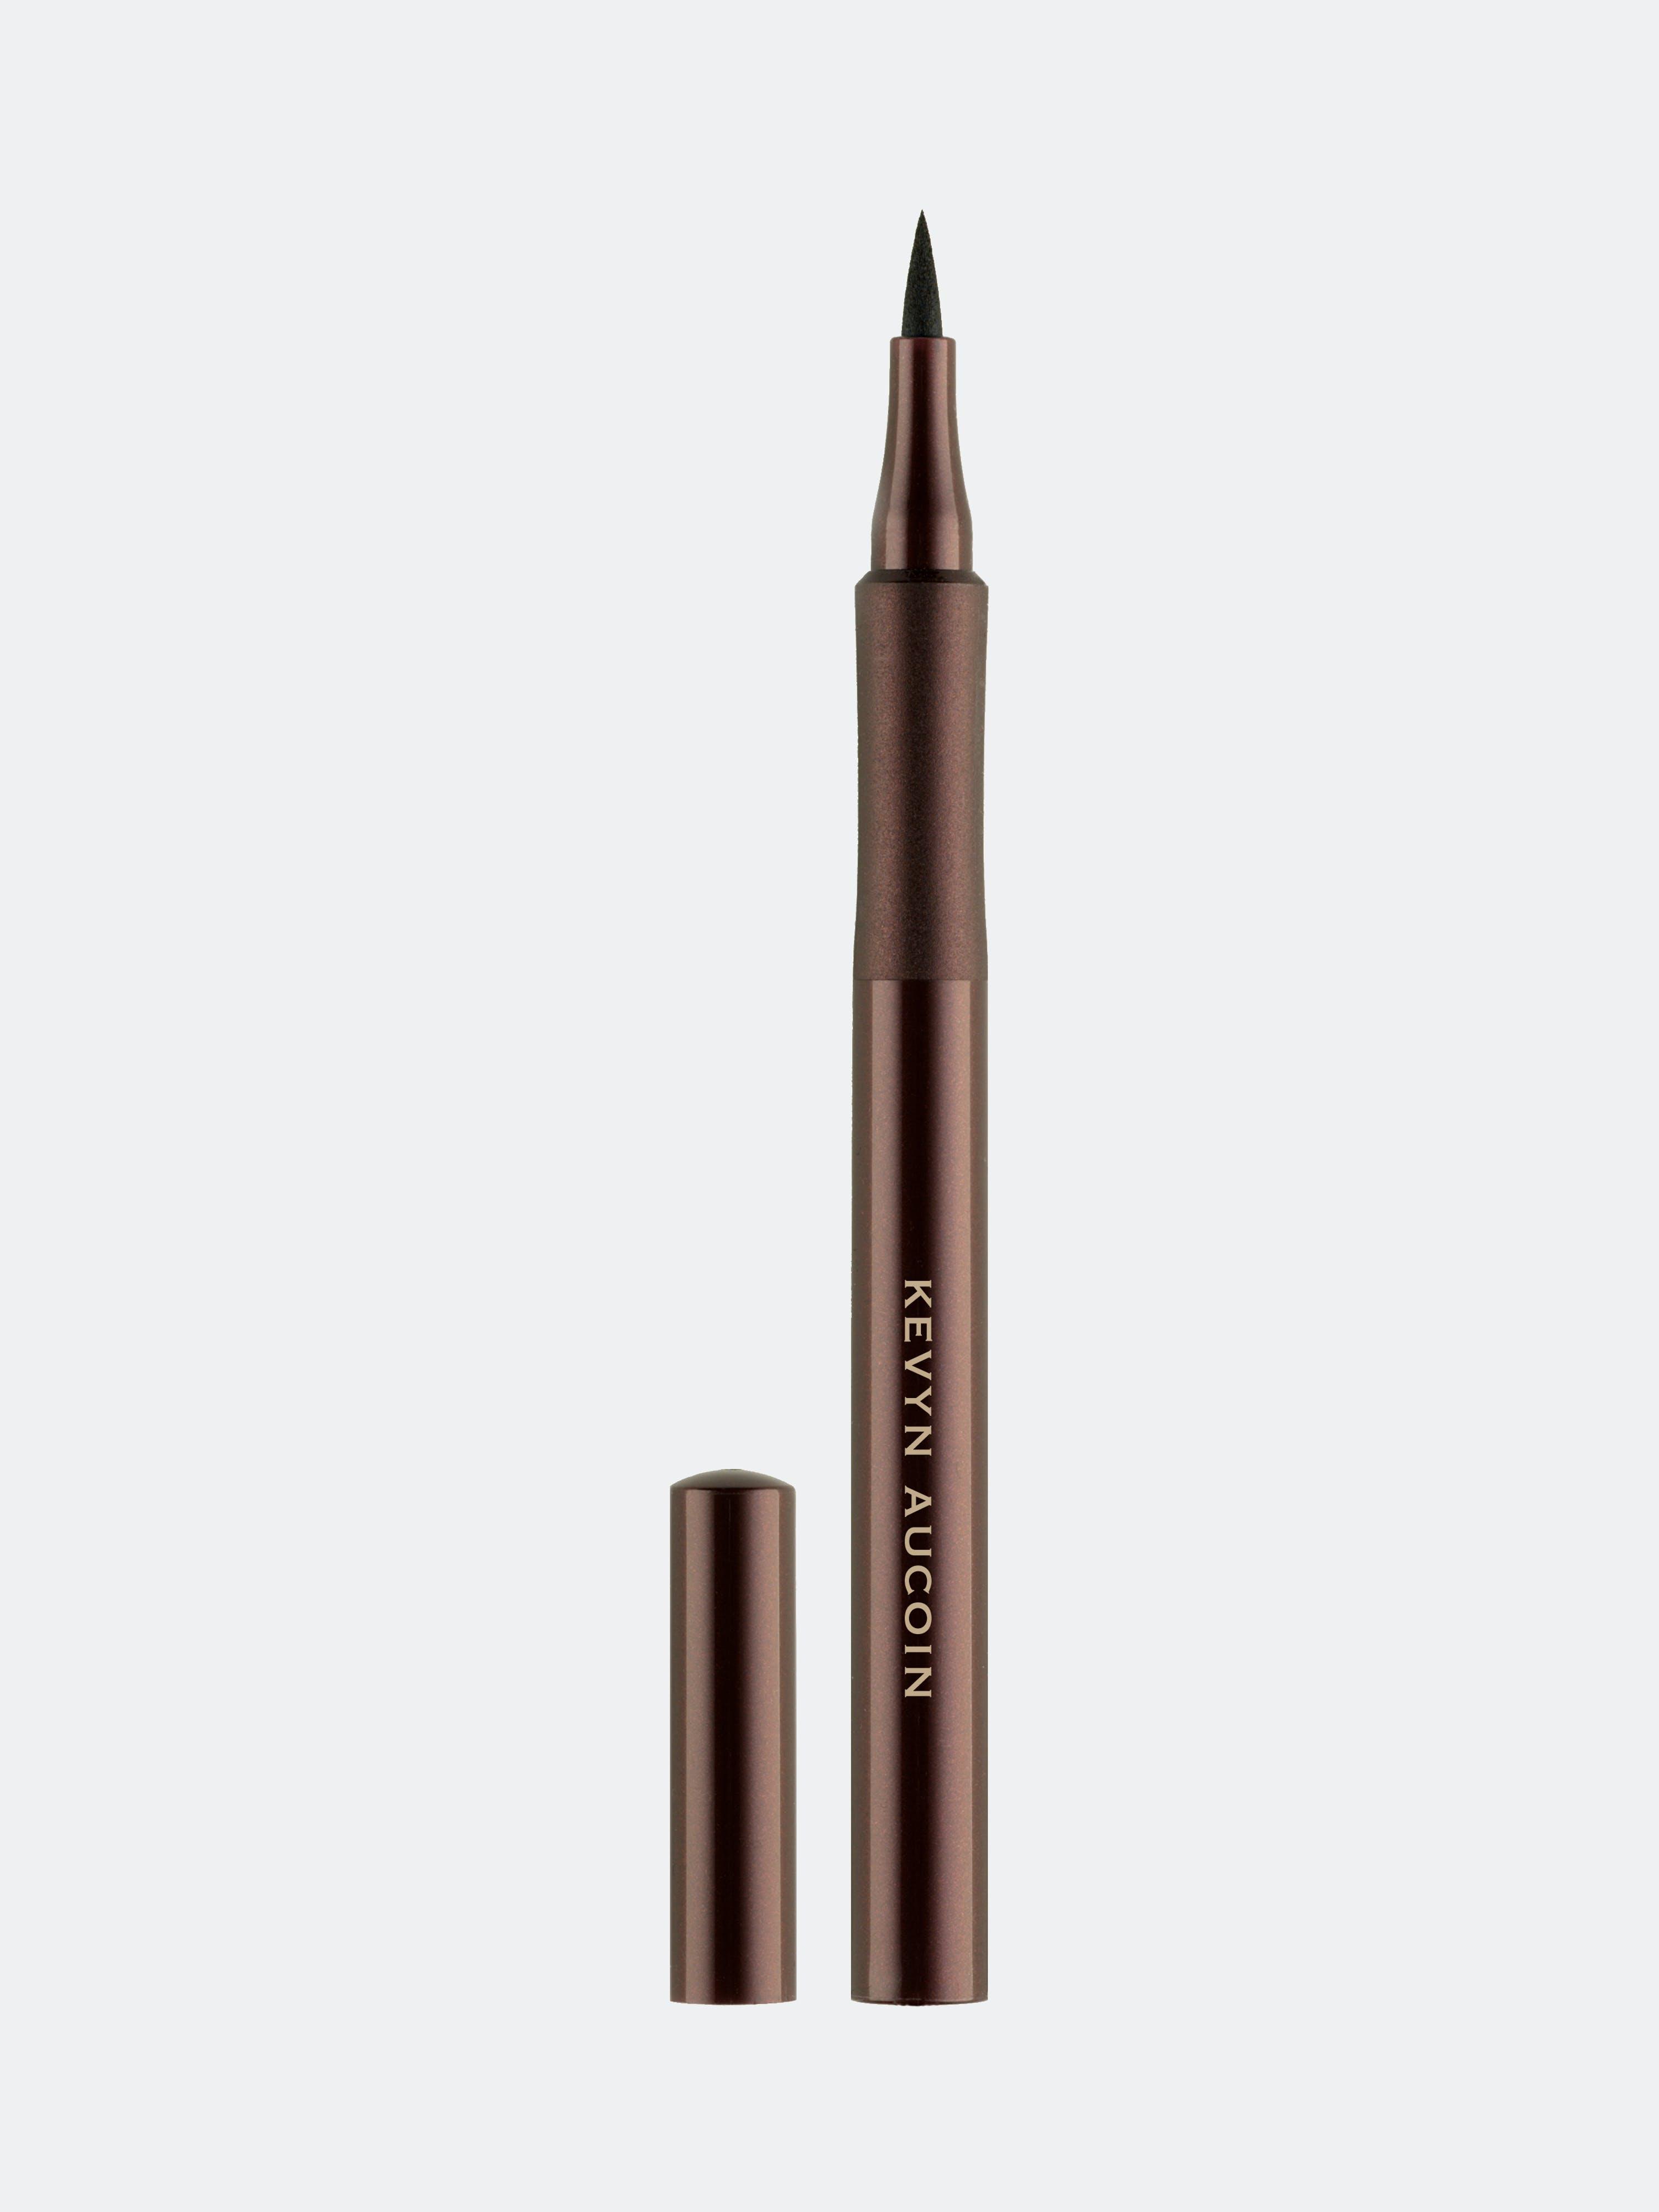 Kevyn Aucoin The Precision Liquid Liner In Black